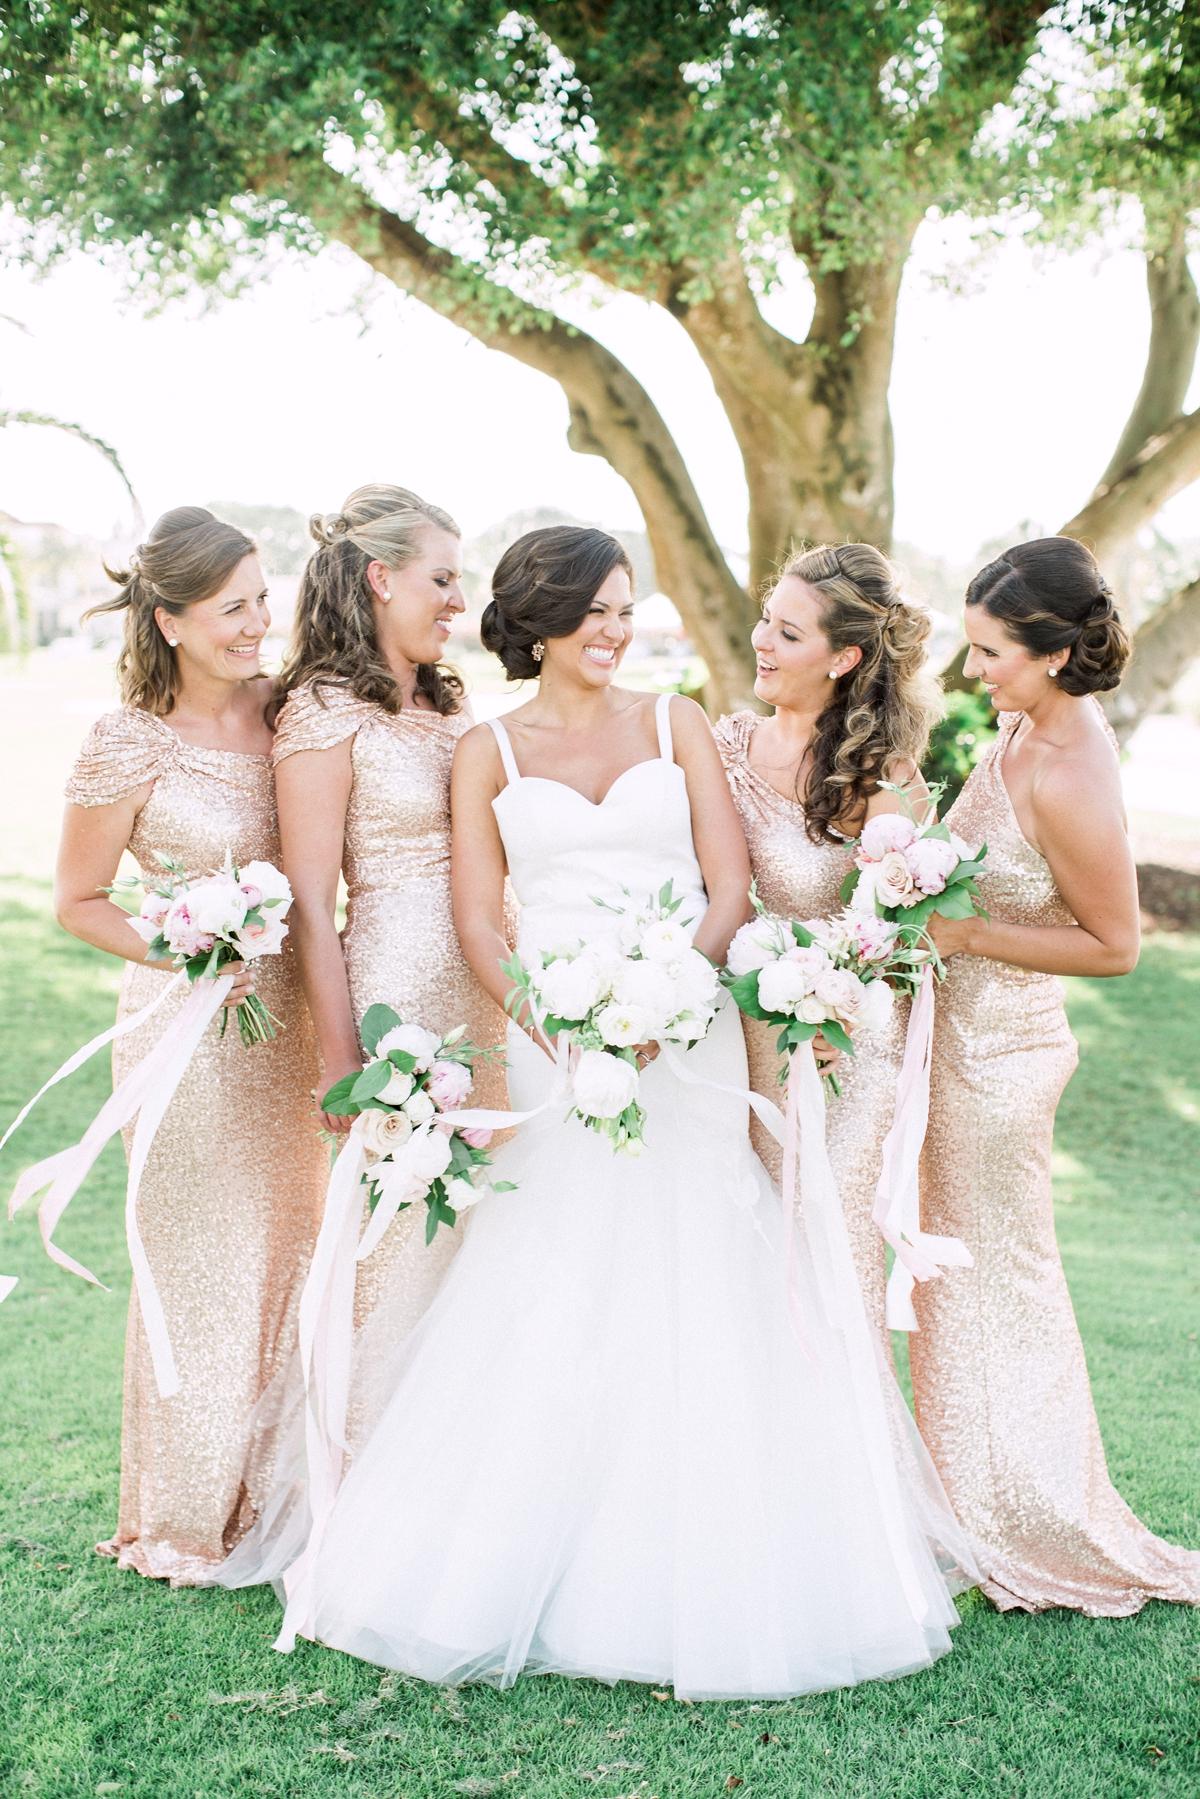 Gasparilla Inn-Boca Grande Wedding Photographer._0275.jpg